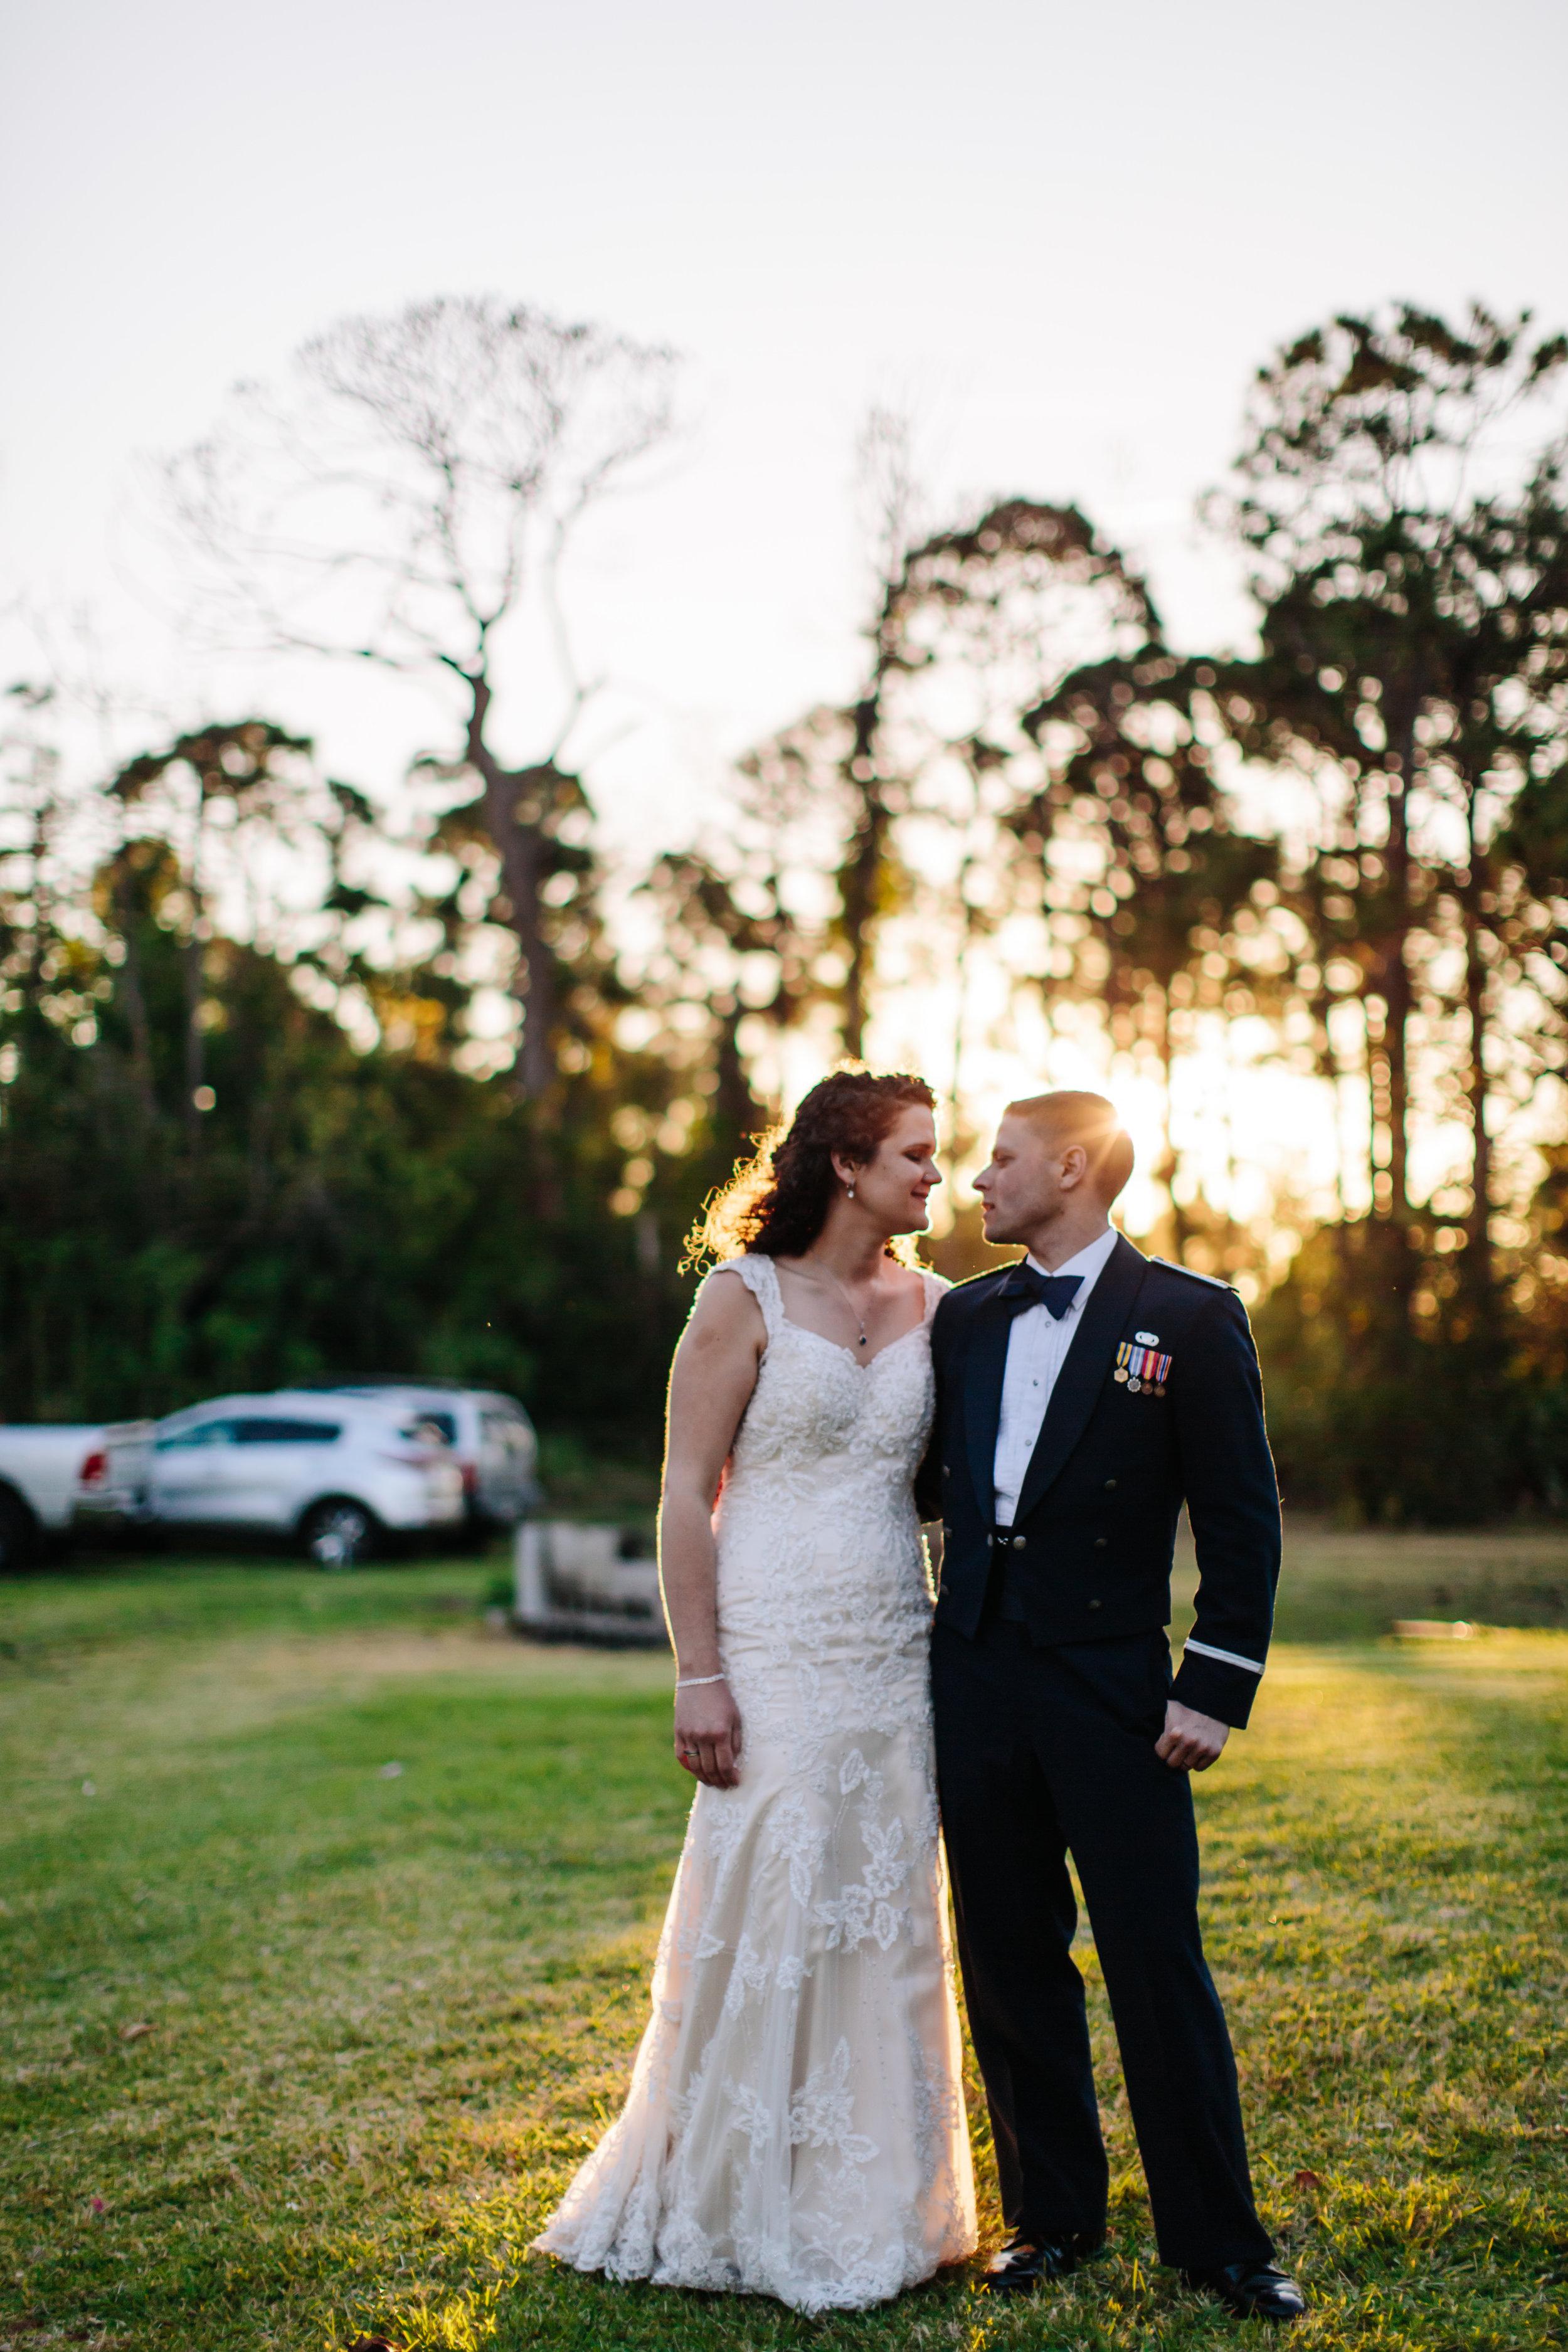 2018.03.17 Allison and Chuck Wedding Waelti Melbourne (767 of 569).jpg